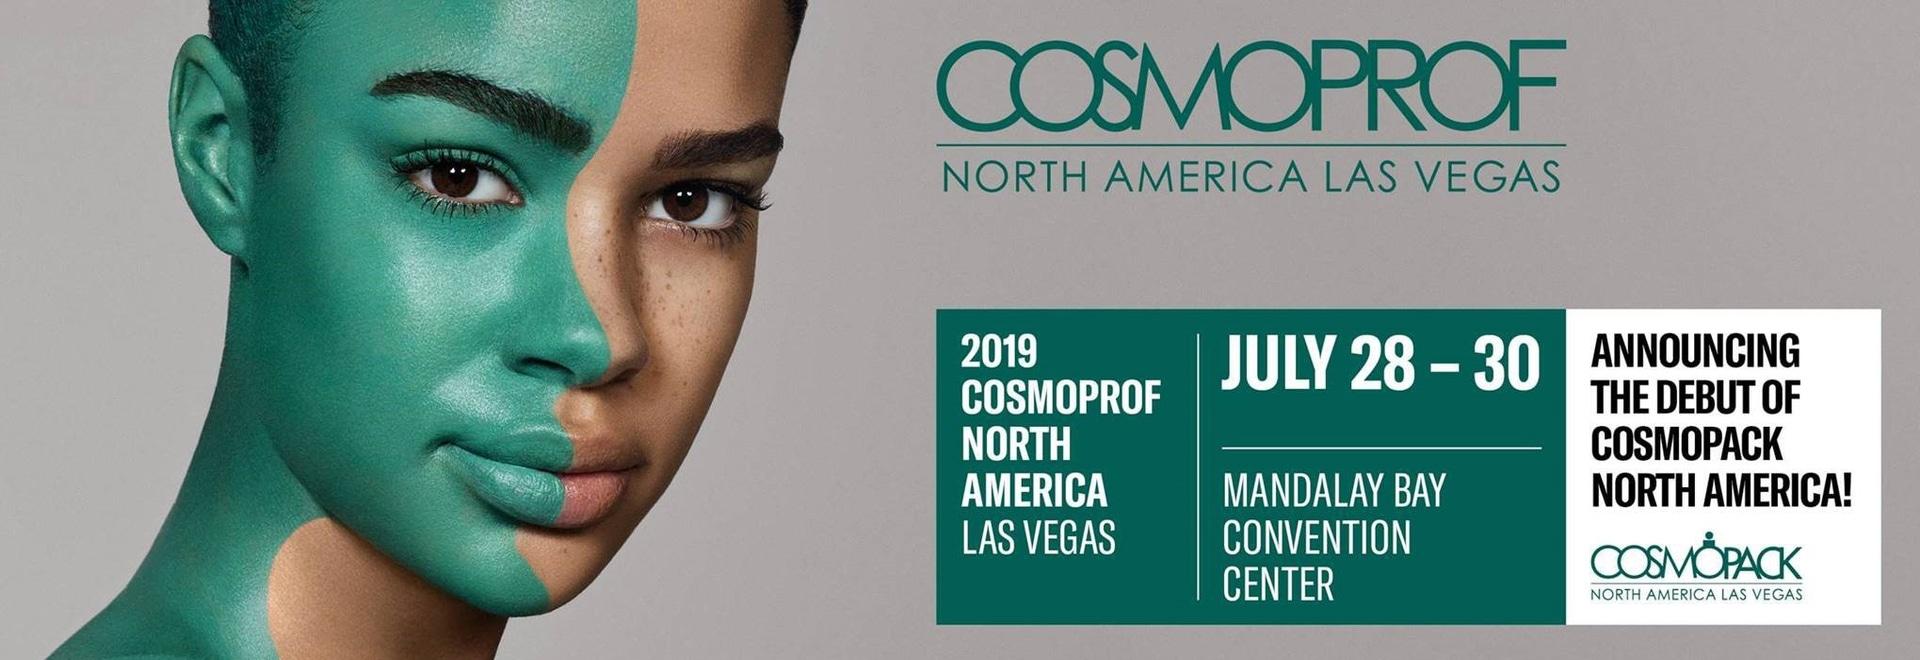 Cosmoprof North America - Las Vegas USA